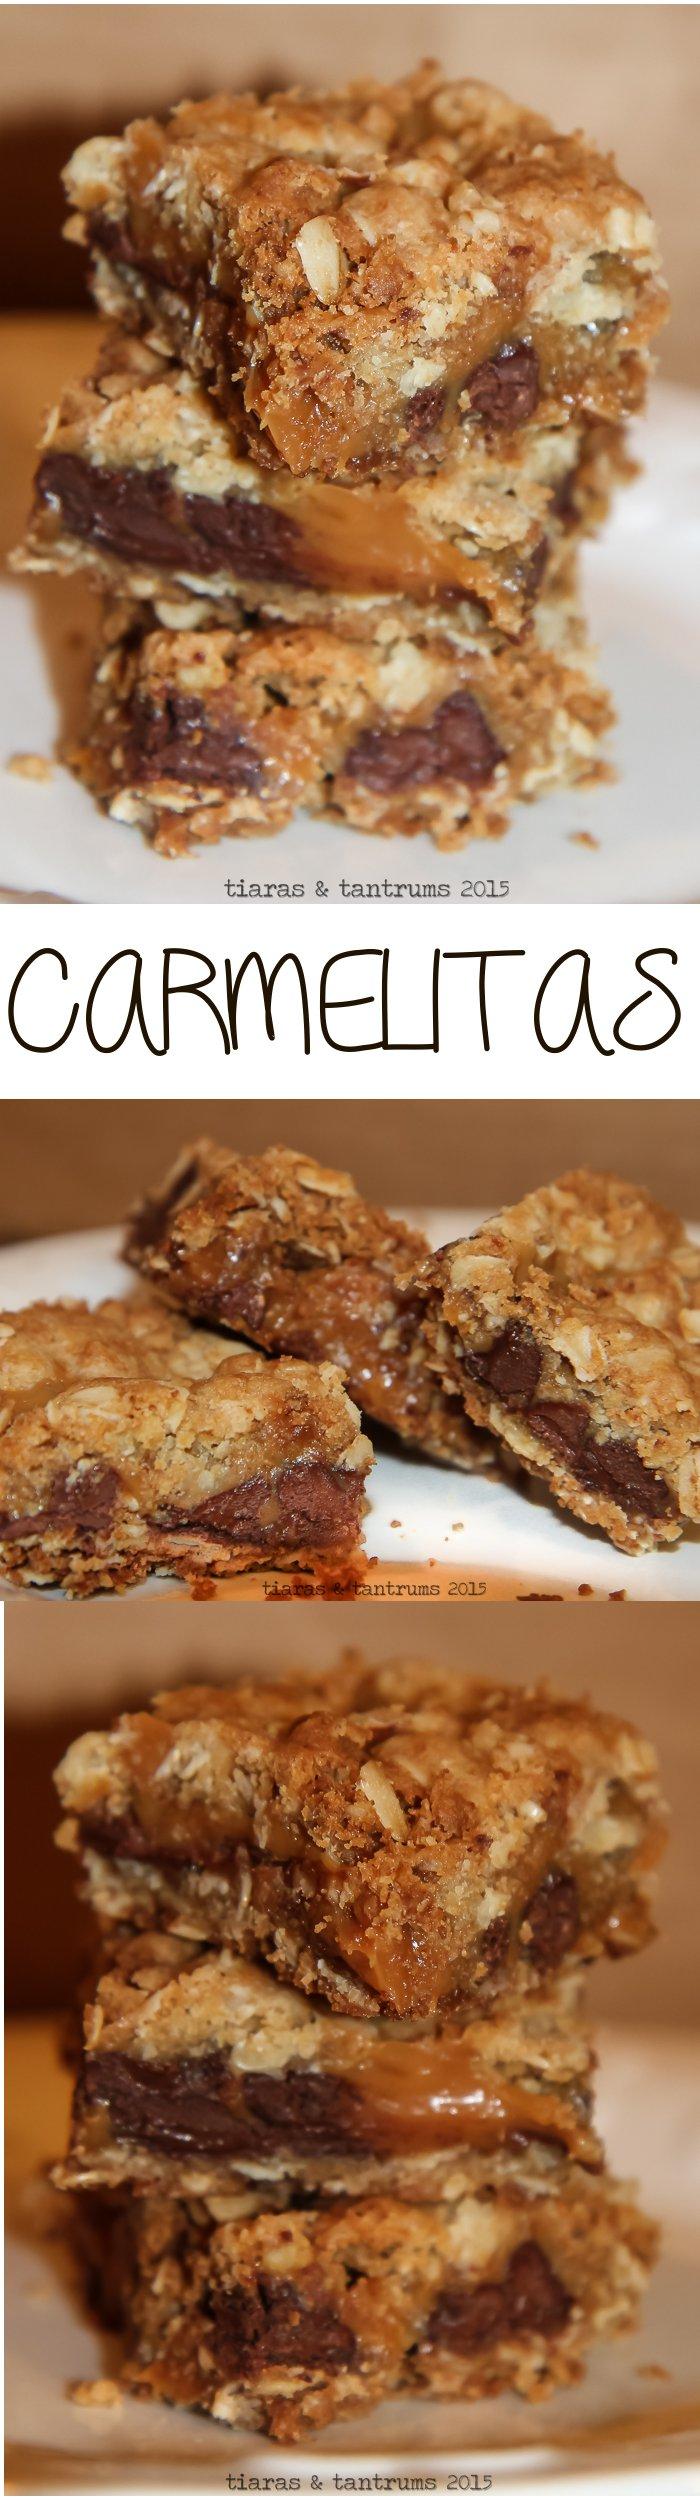 Chocolate Caramel Oatmeal Bars AKA: Carmelitas